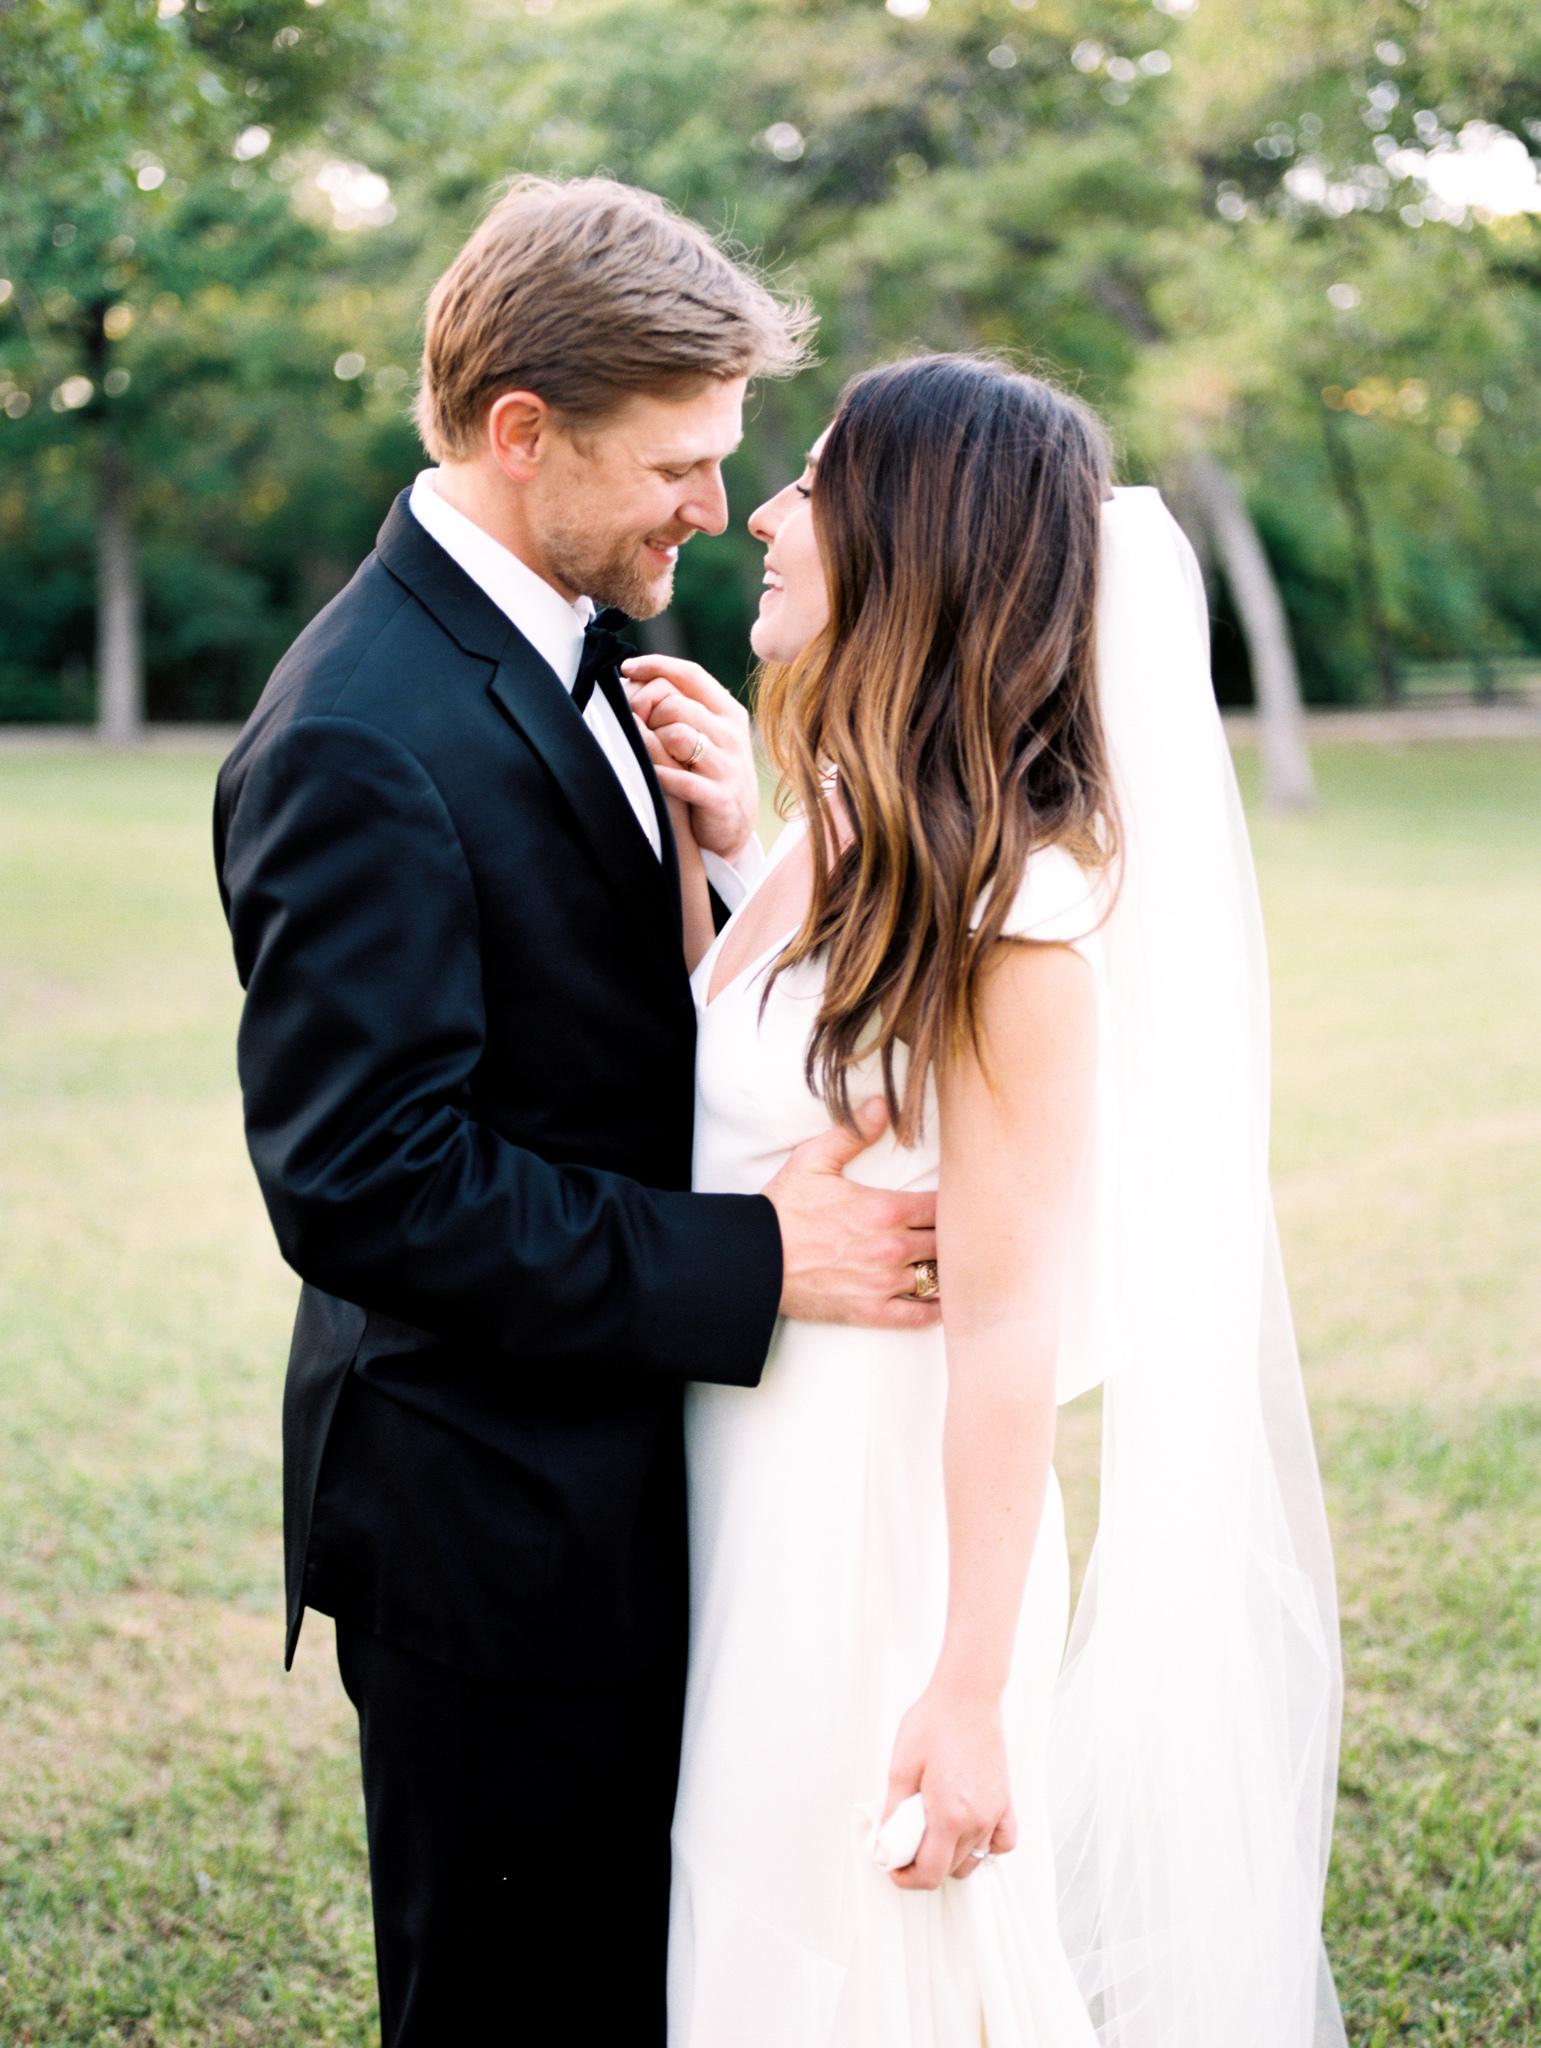 texas bride, college station, kristina ross photography, aggie bride, wind dancer retreat, texas, brazos valley bride